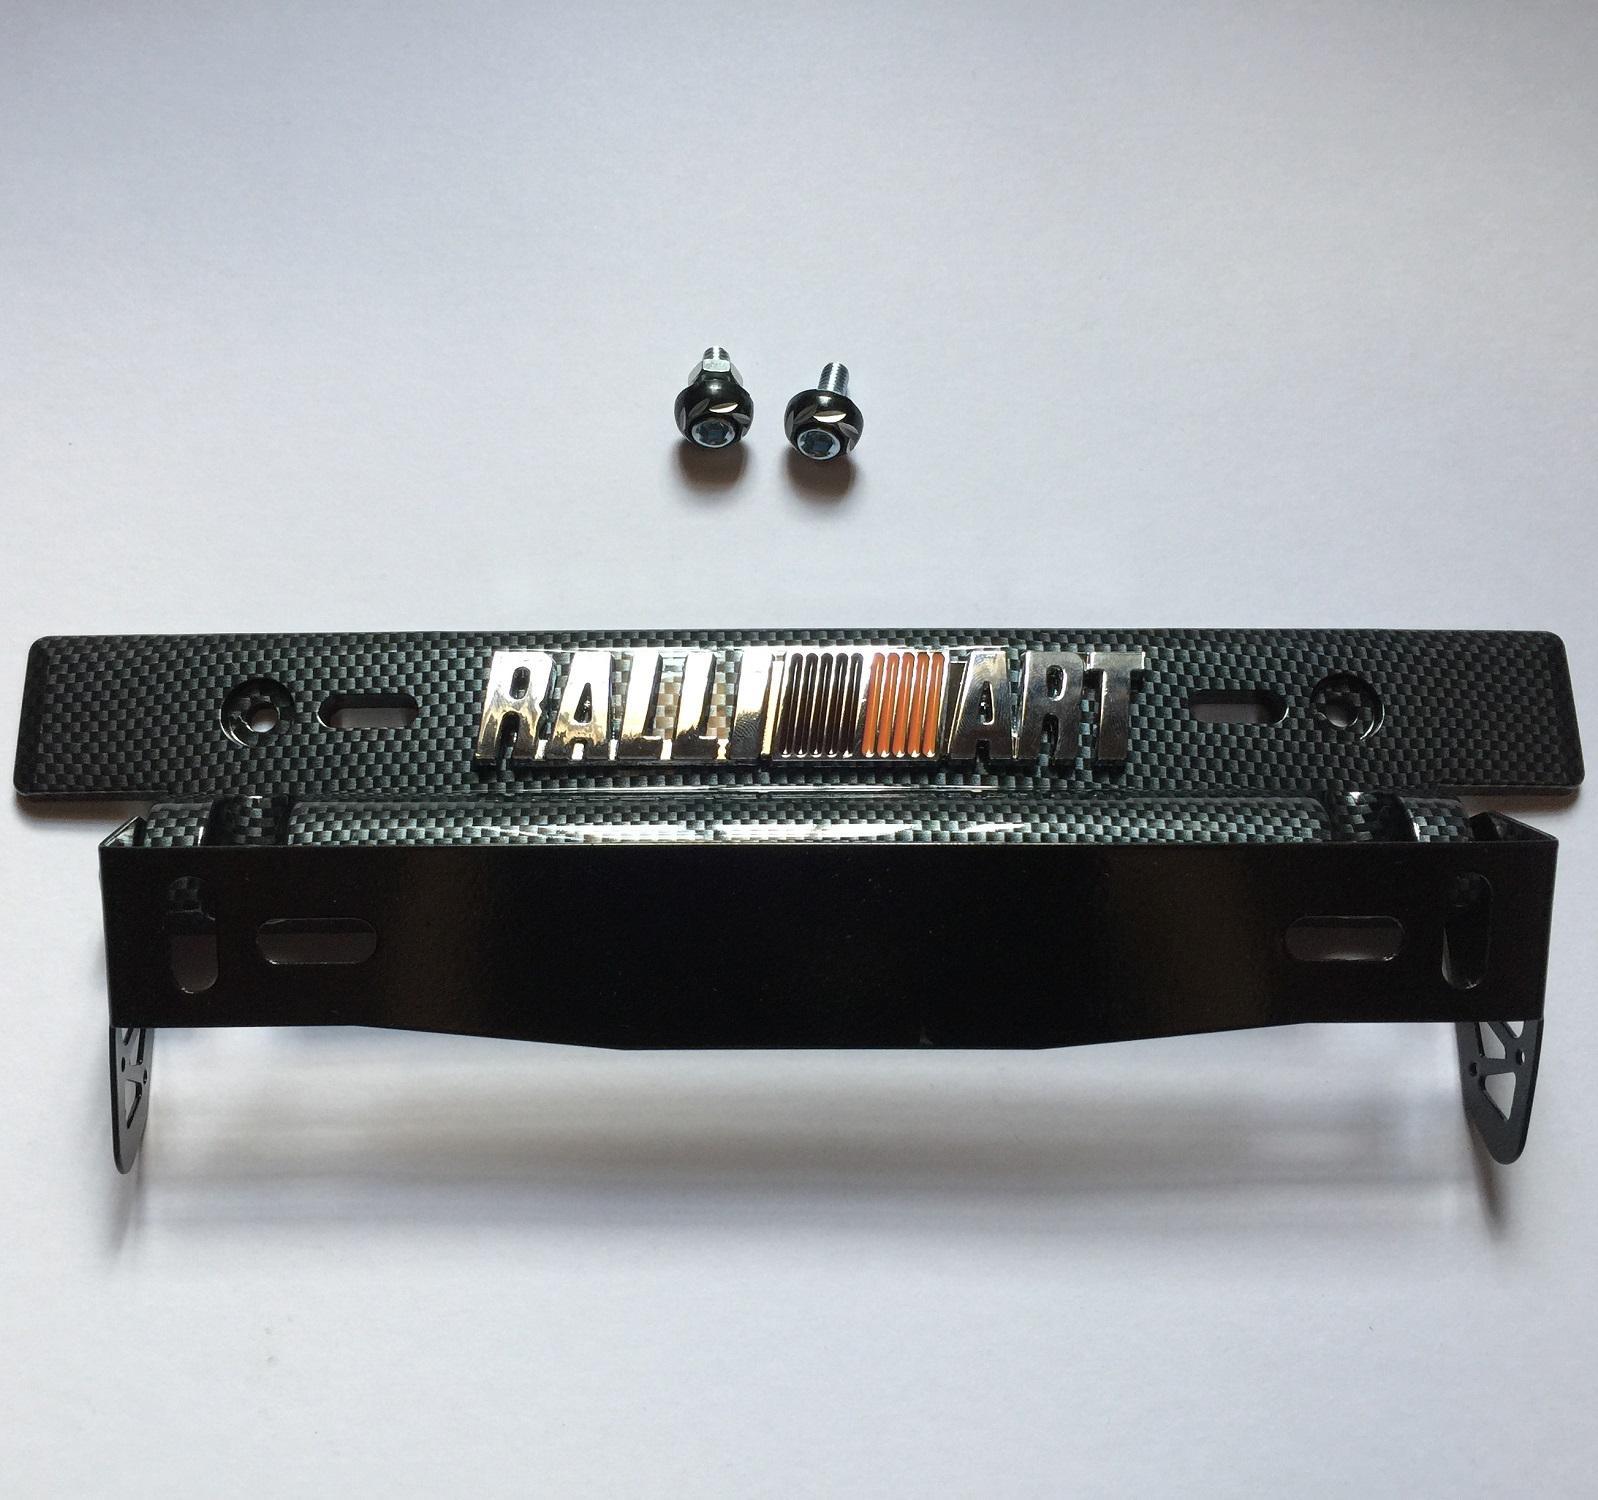 Ralli Art Car Tilting Plate Holder License Adjustable Carbon With 3d Emblem Metal By Melonetshoppinas.